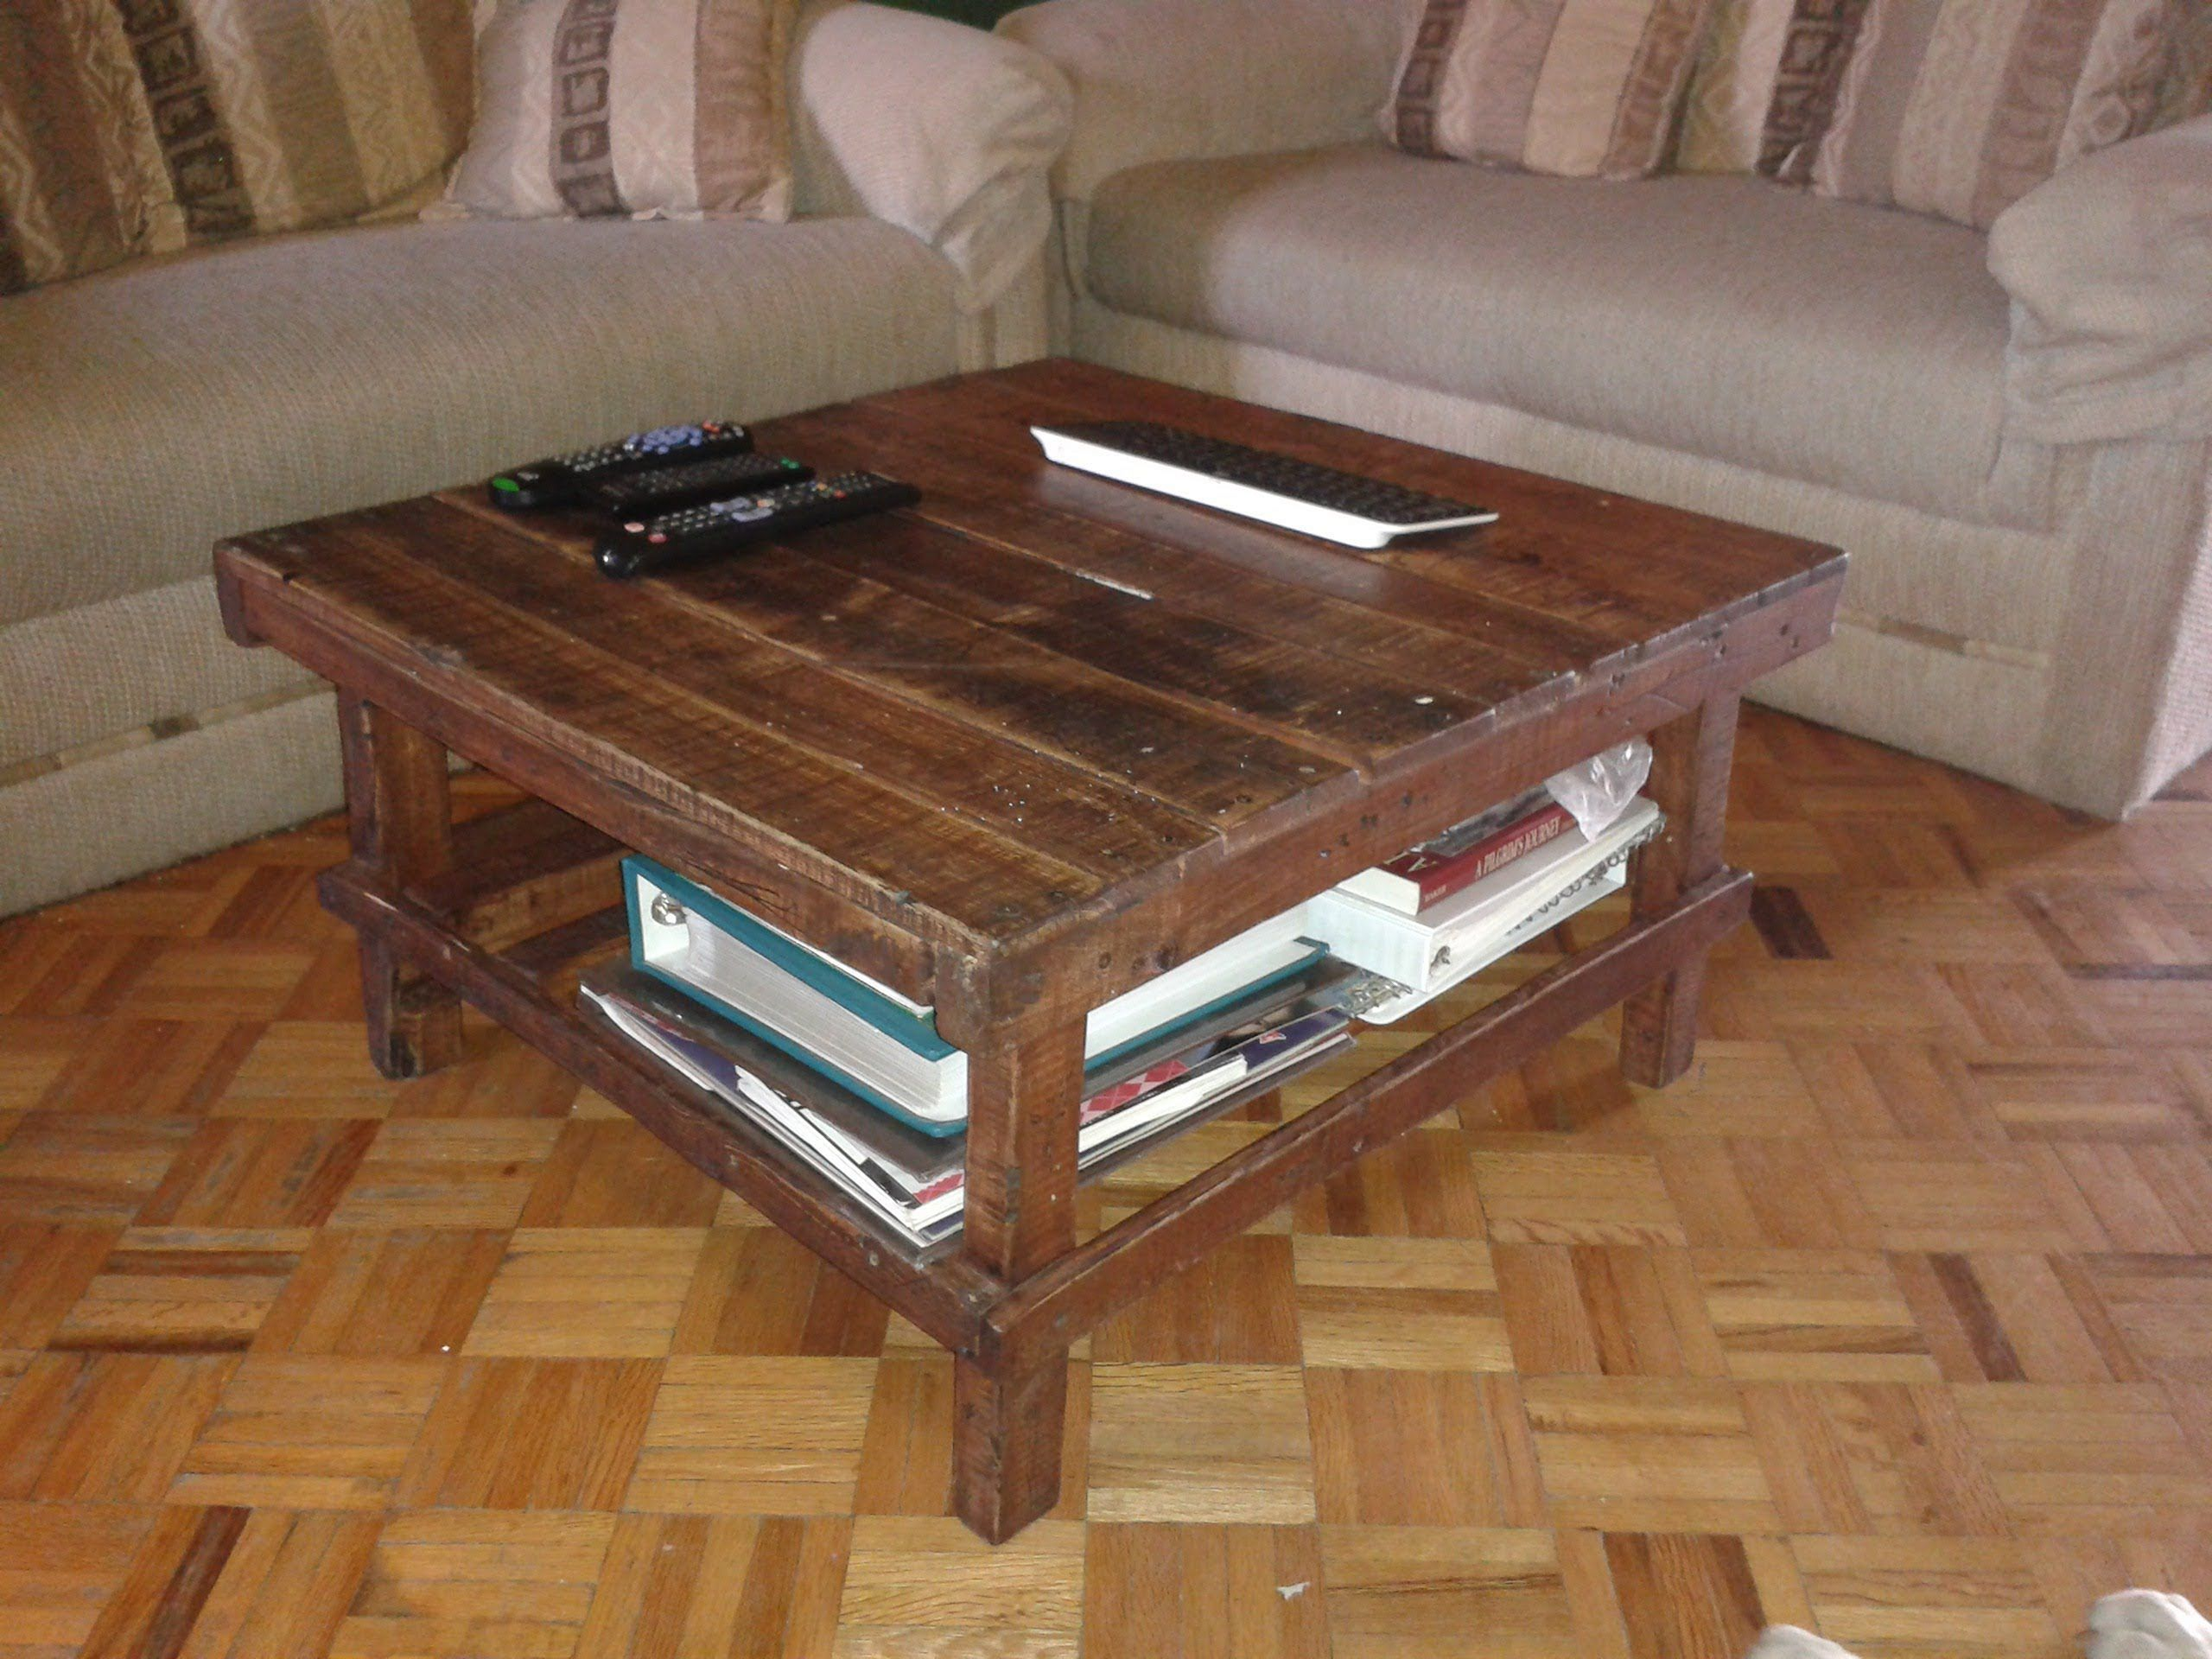 The Best 25+ Extraordinary Wooden Pallet Furniture Ideas Httpswahyuputracomfurniture25 Extraordinary Wooden Pallet Furniture Ideas 701